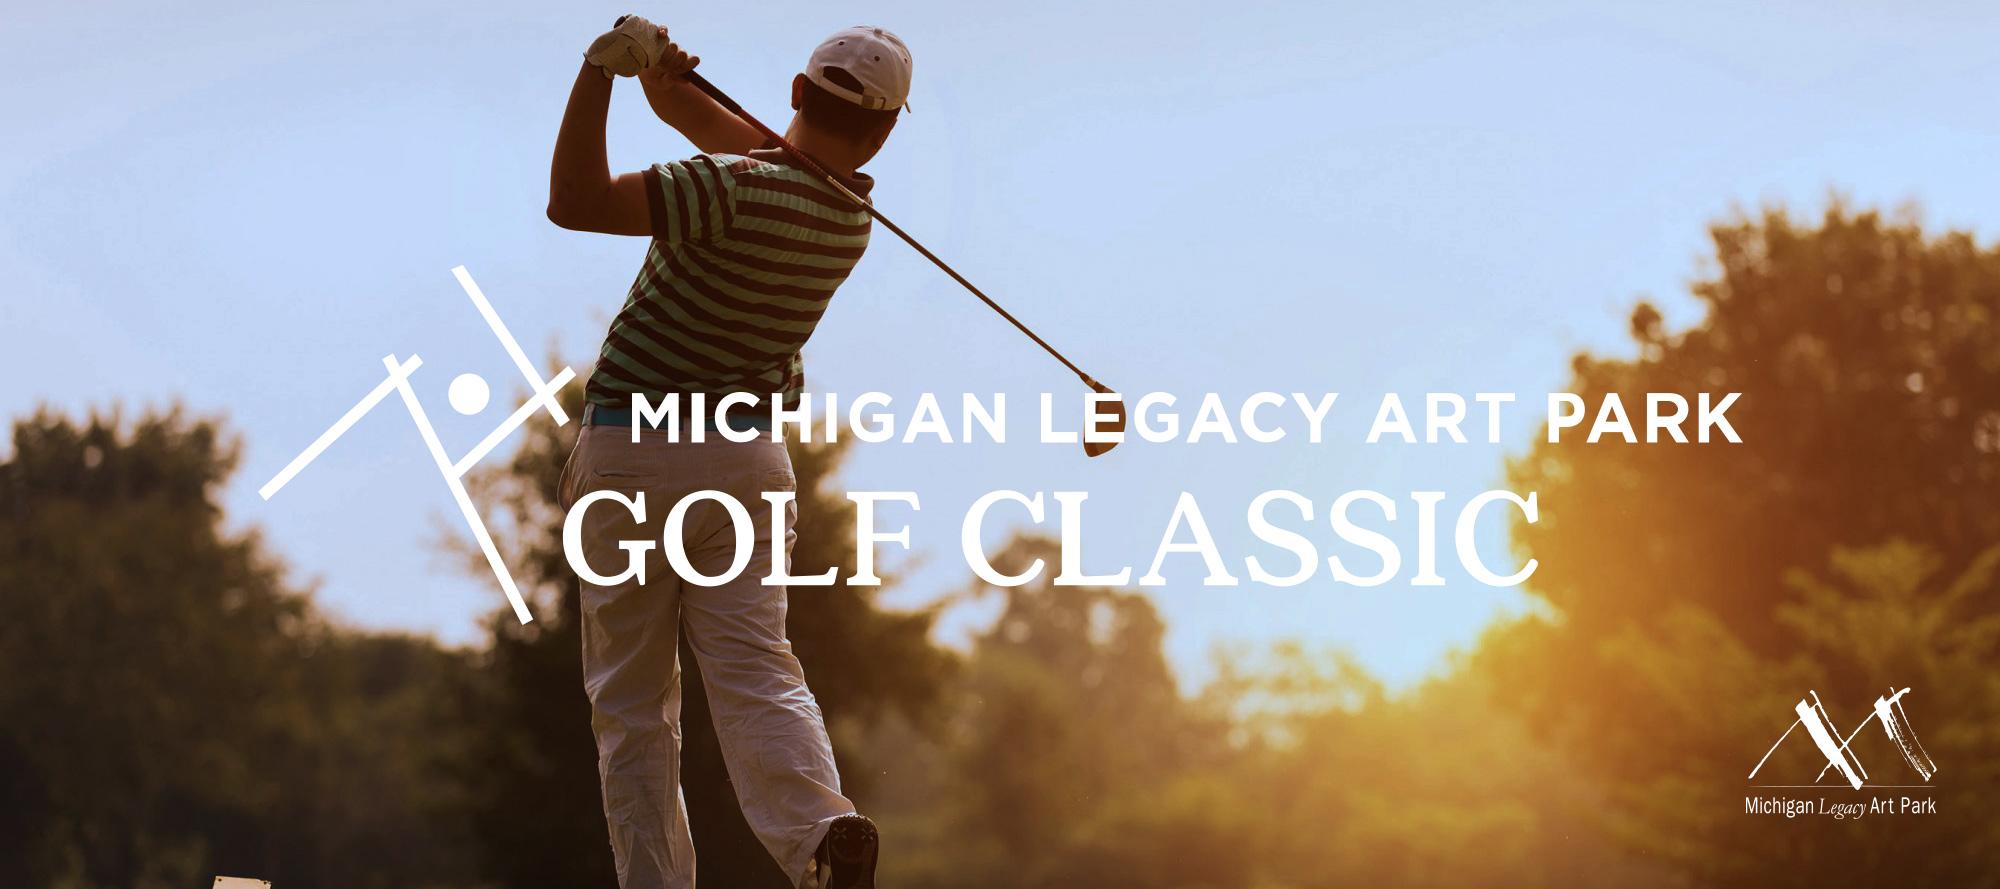 Michigan Legacy Art Park Golf Classic 2017